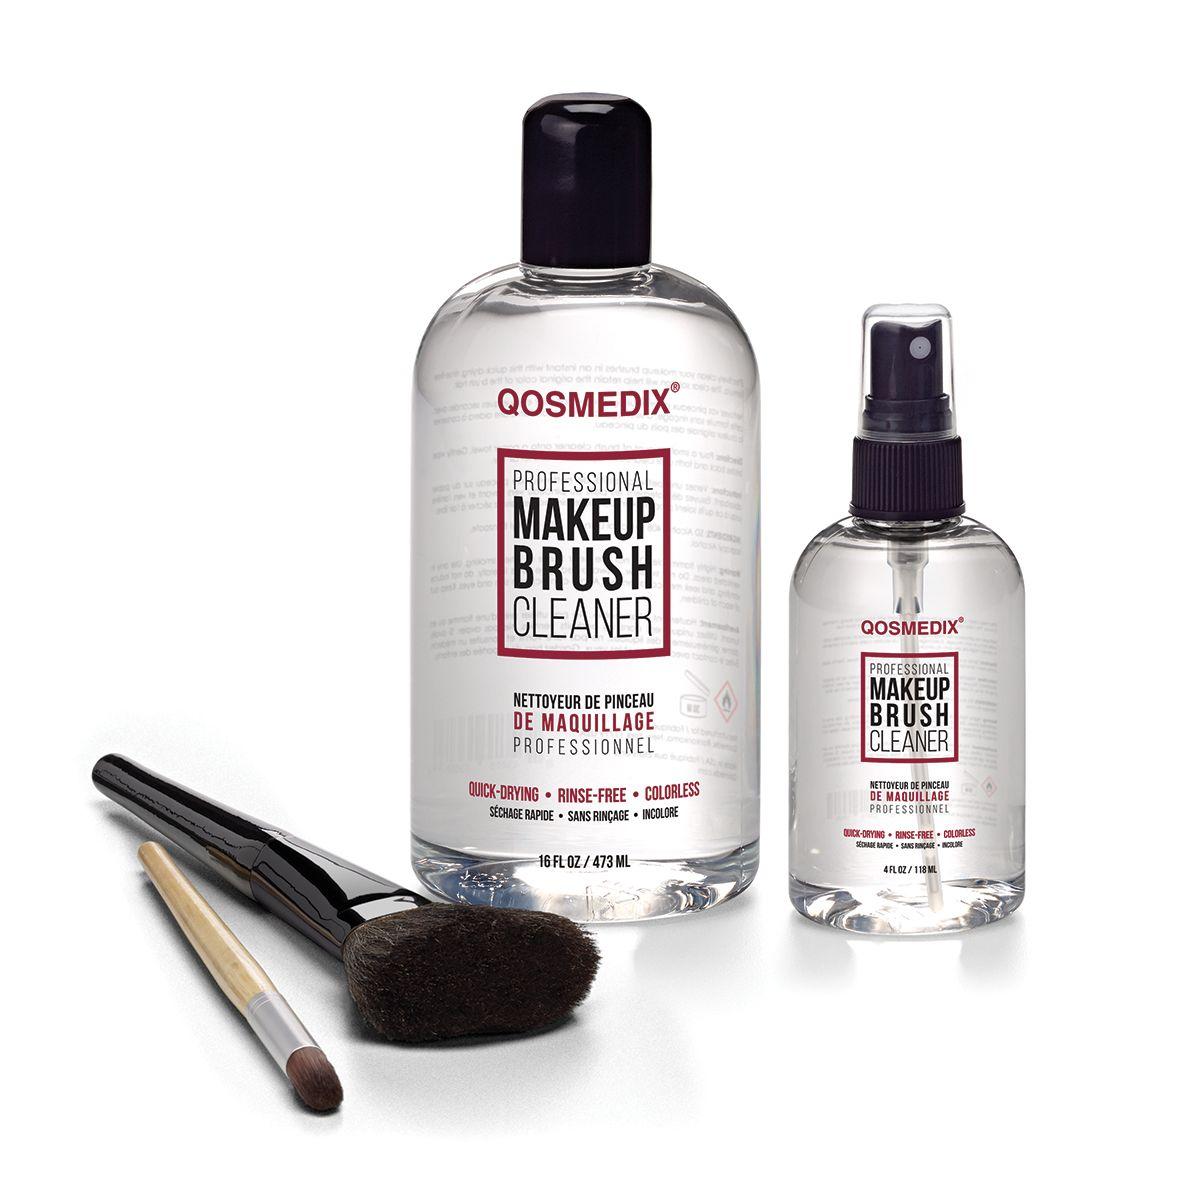 Professional Makeup Brush Cleaner Homemade makeup brush